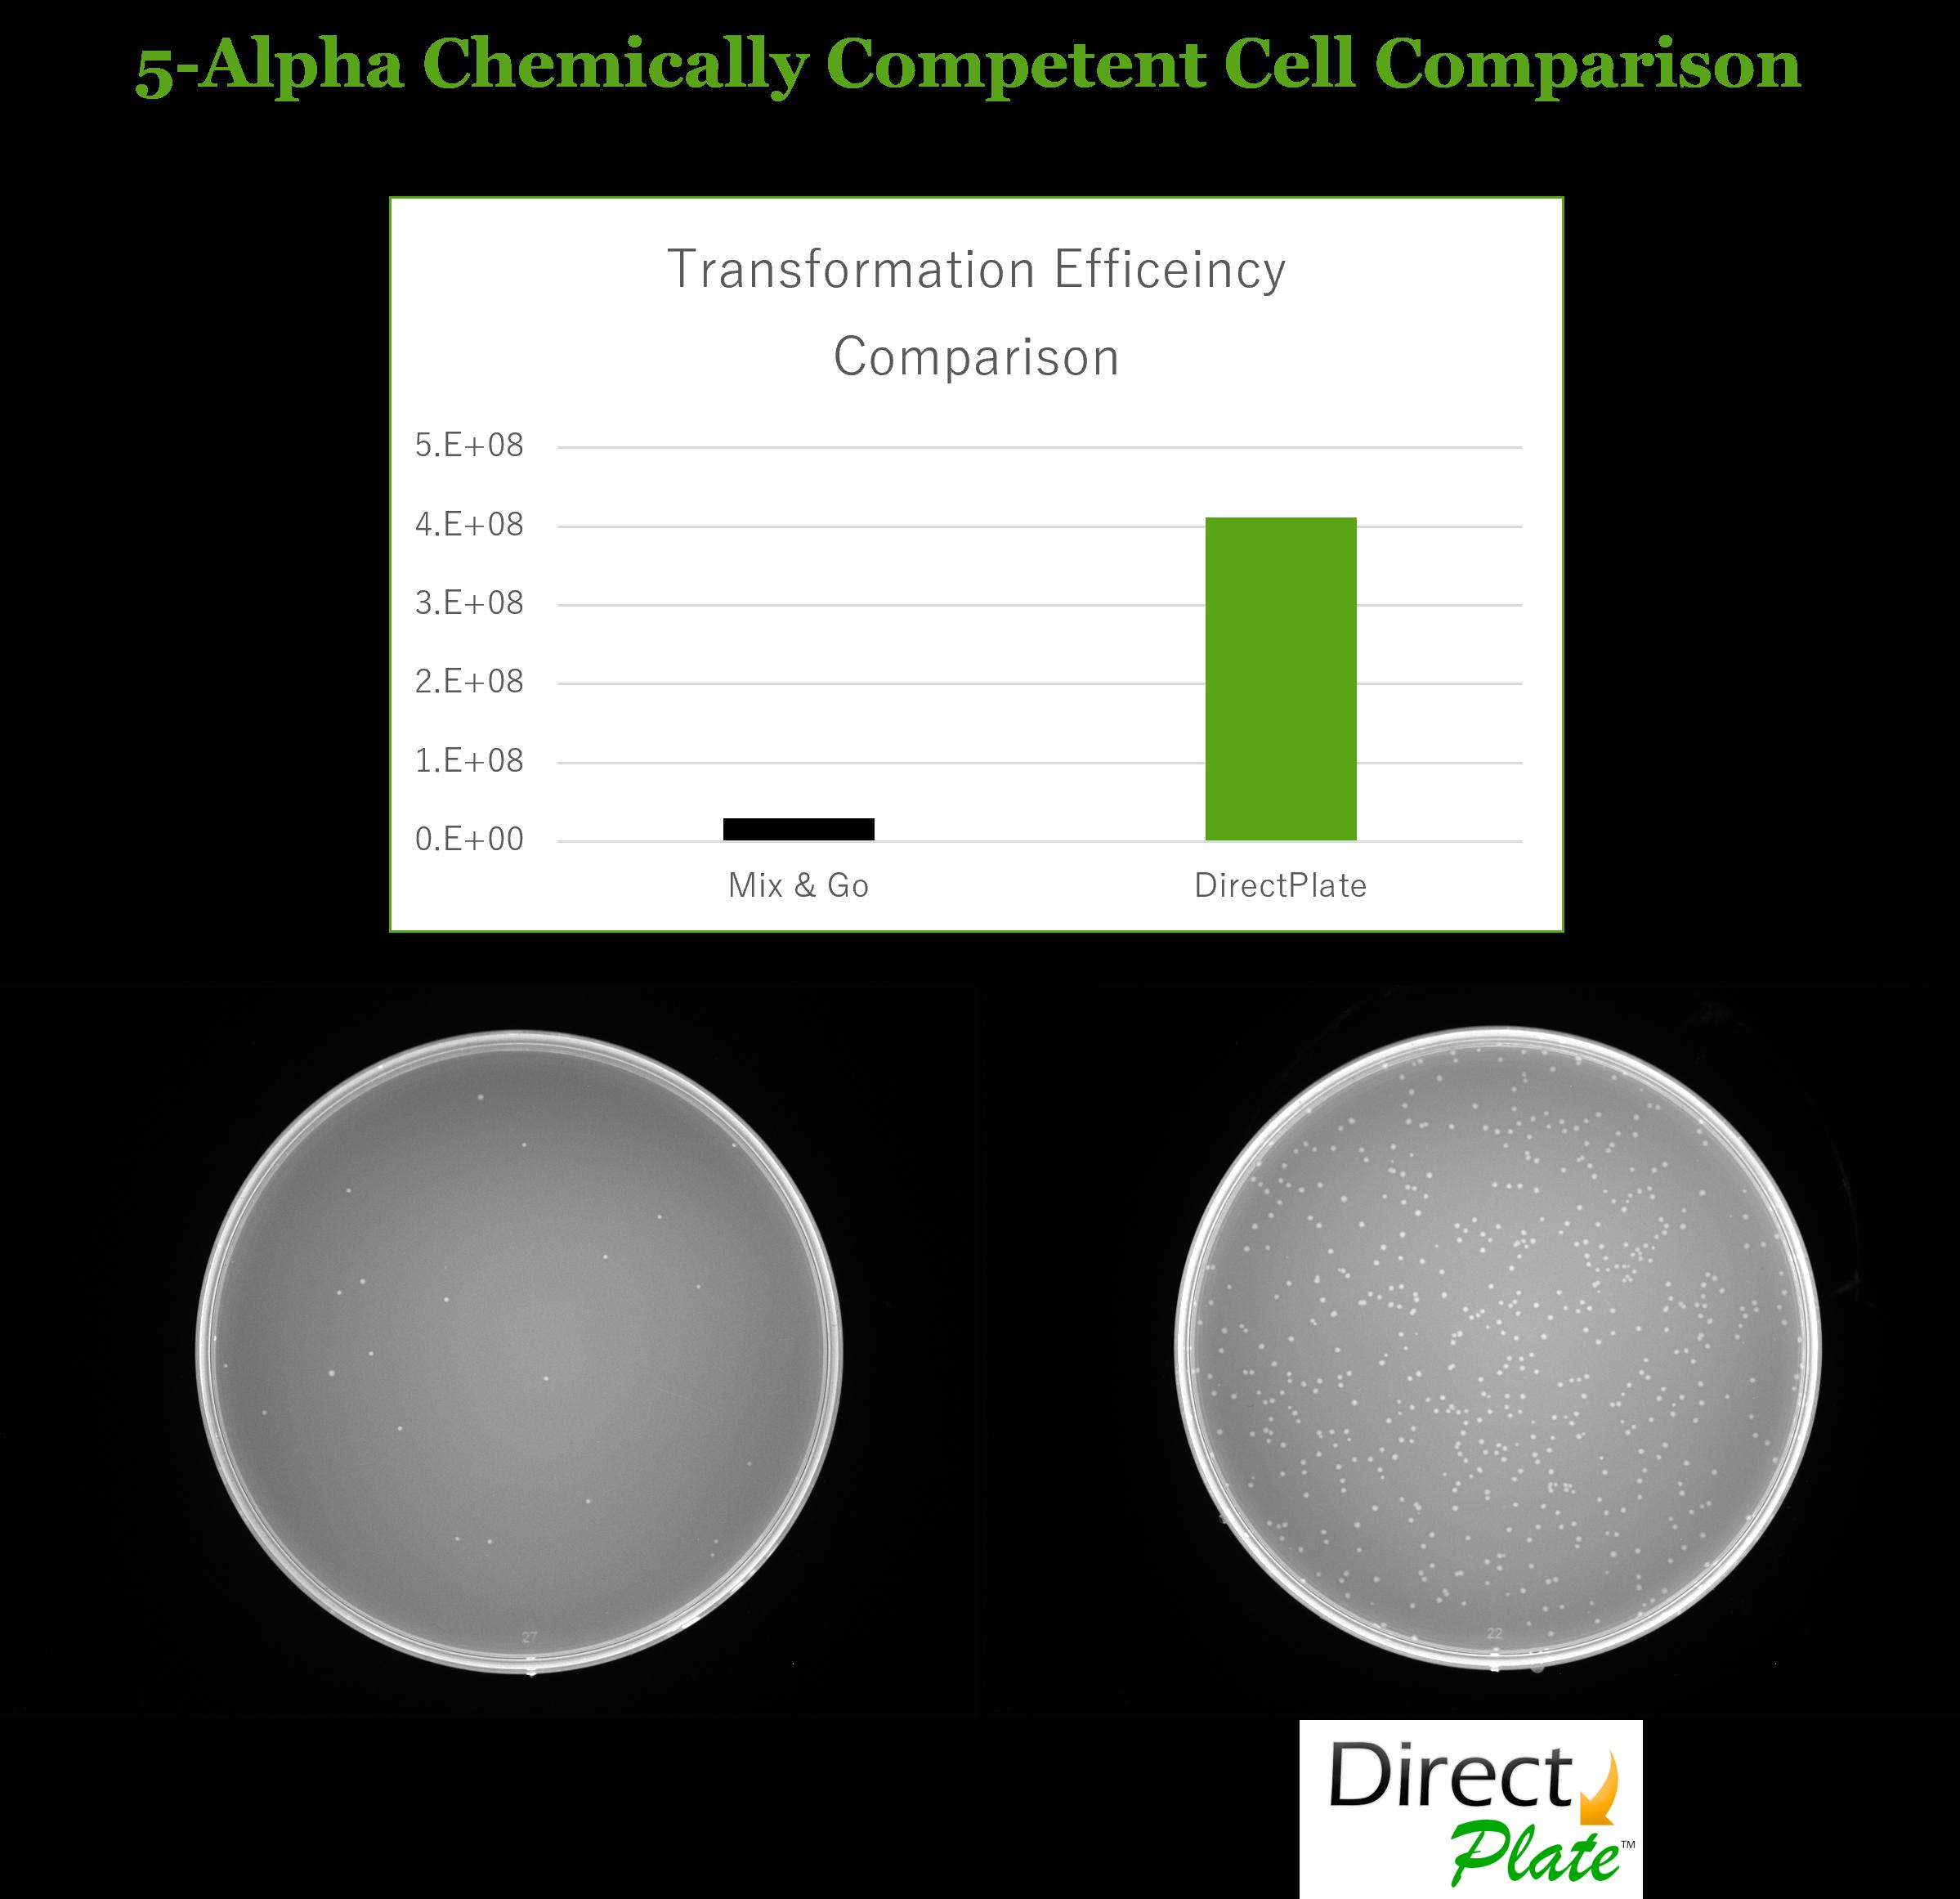 Direct Plate vs ZYMO 5-alpha Competent Cell Comparison